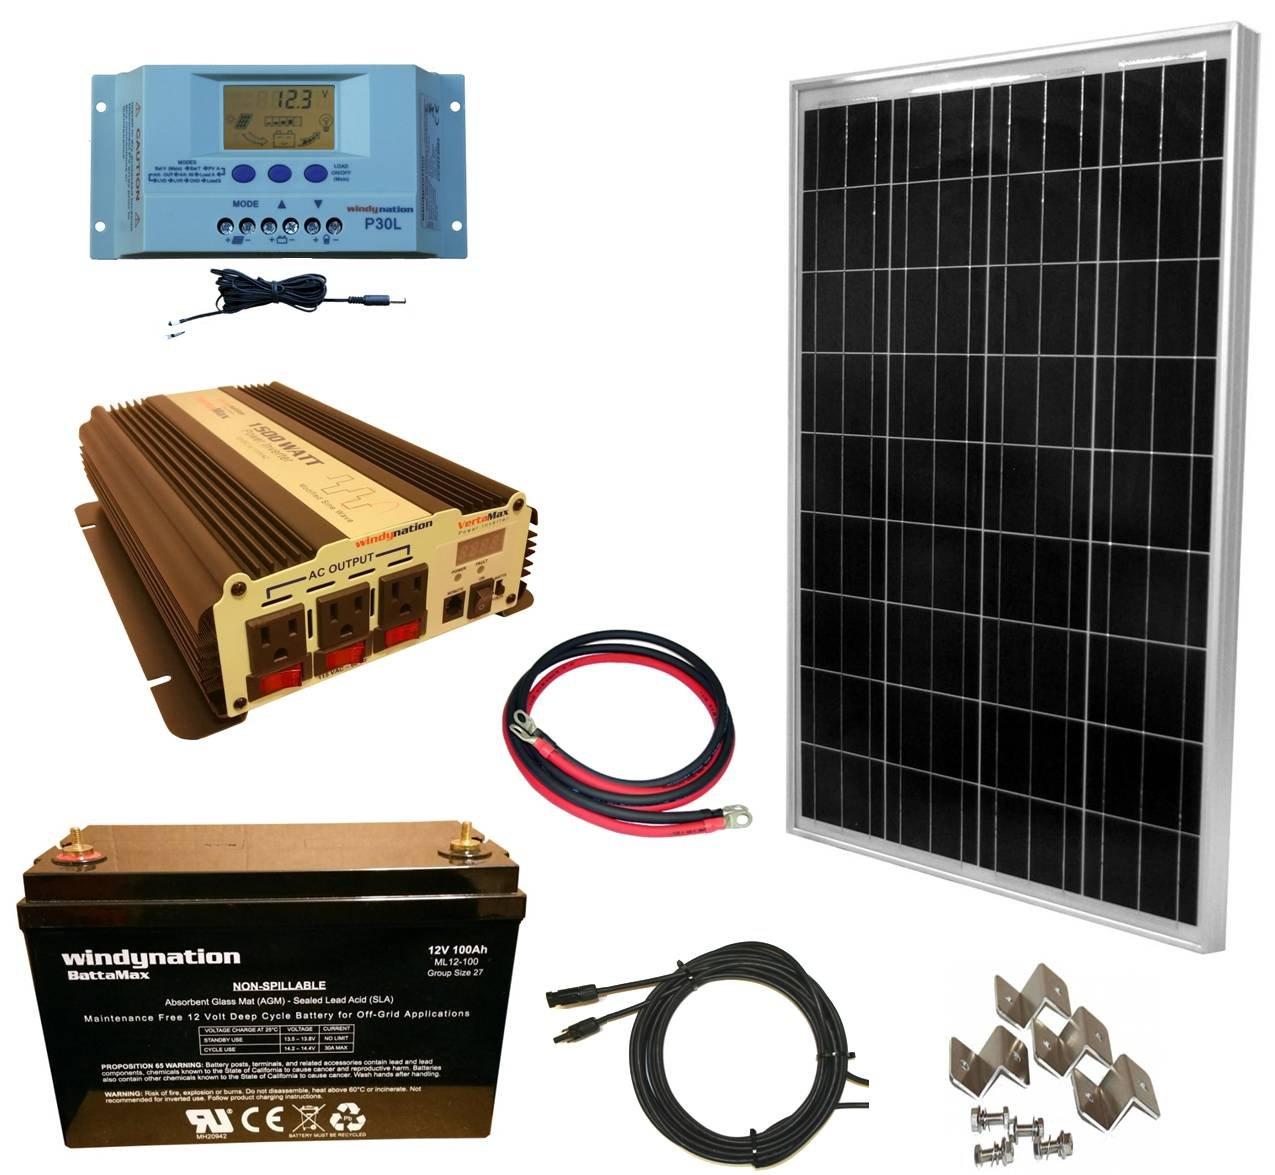 WindyNation 100 Watt Solar Panel Kit + 1500W VertaMax Power Inverter + 100ah AGM Deep Cycle Battery for RV, Boat, Off-Grid 12 Volt